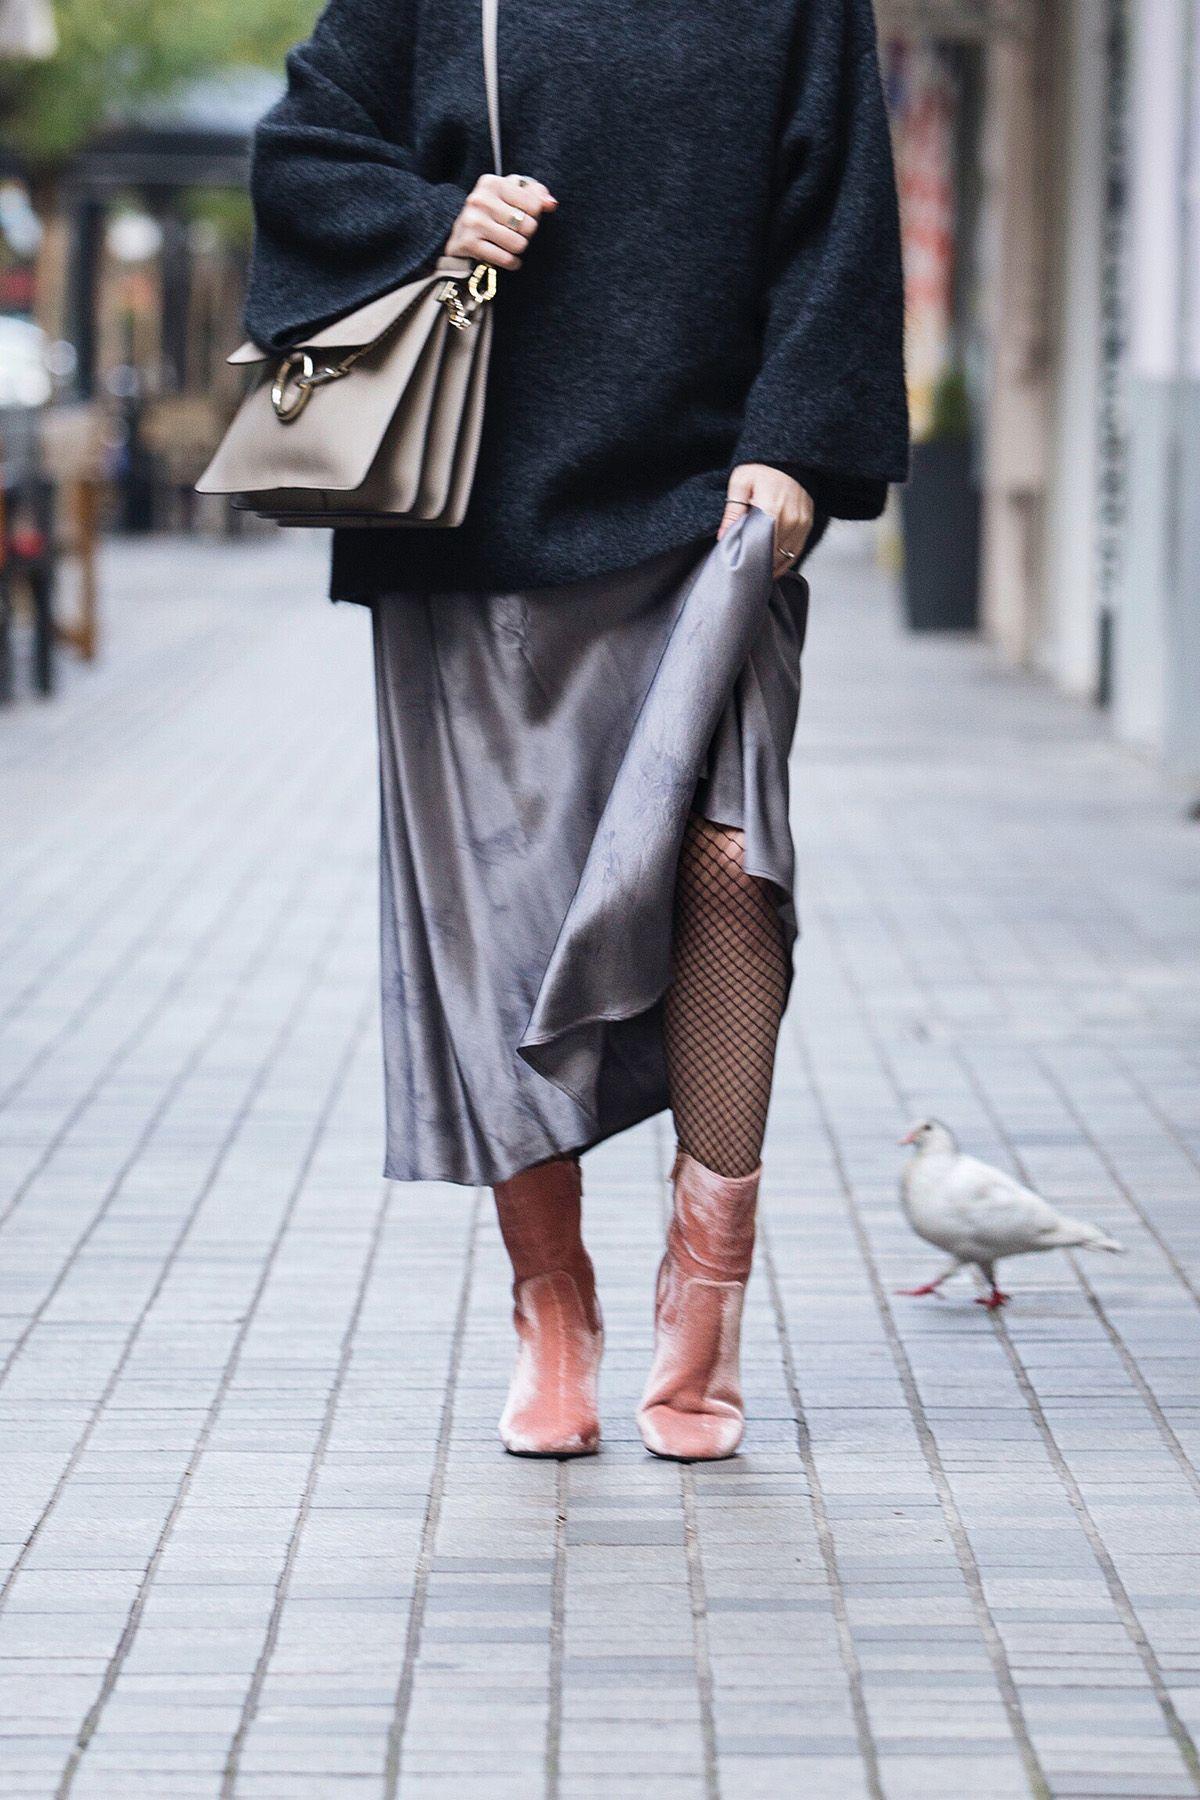 b2879c5f40e7 ... SHOES by Stella Asteria. Pink Velvet Boots   Chloe Faye Bag